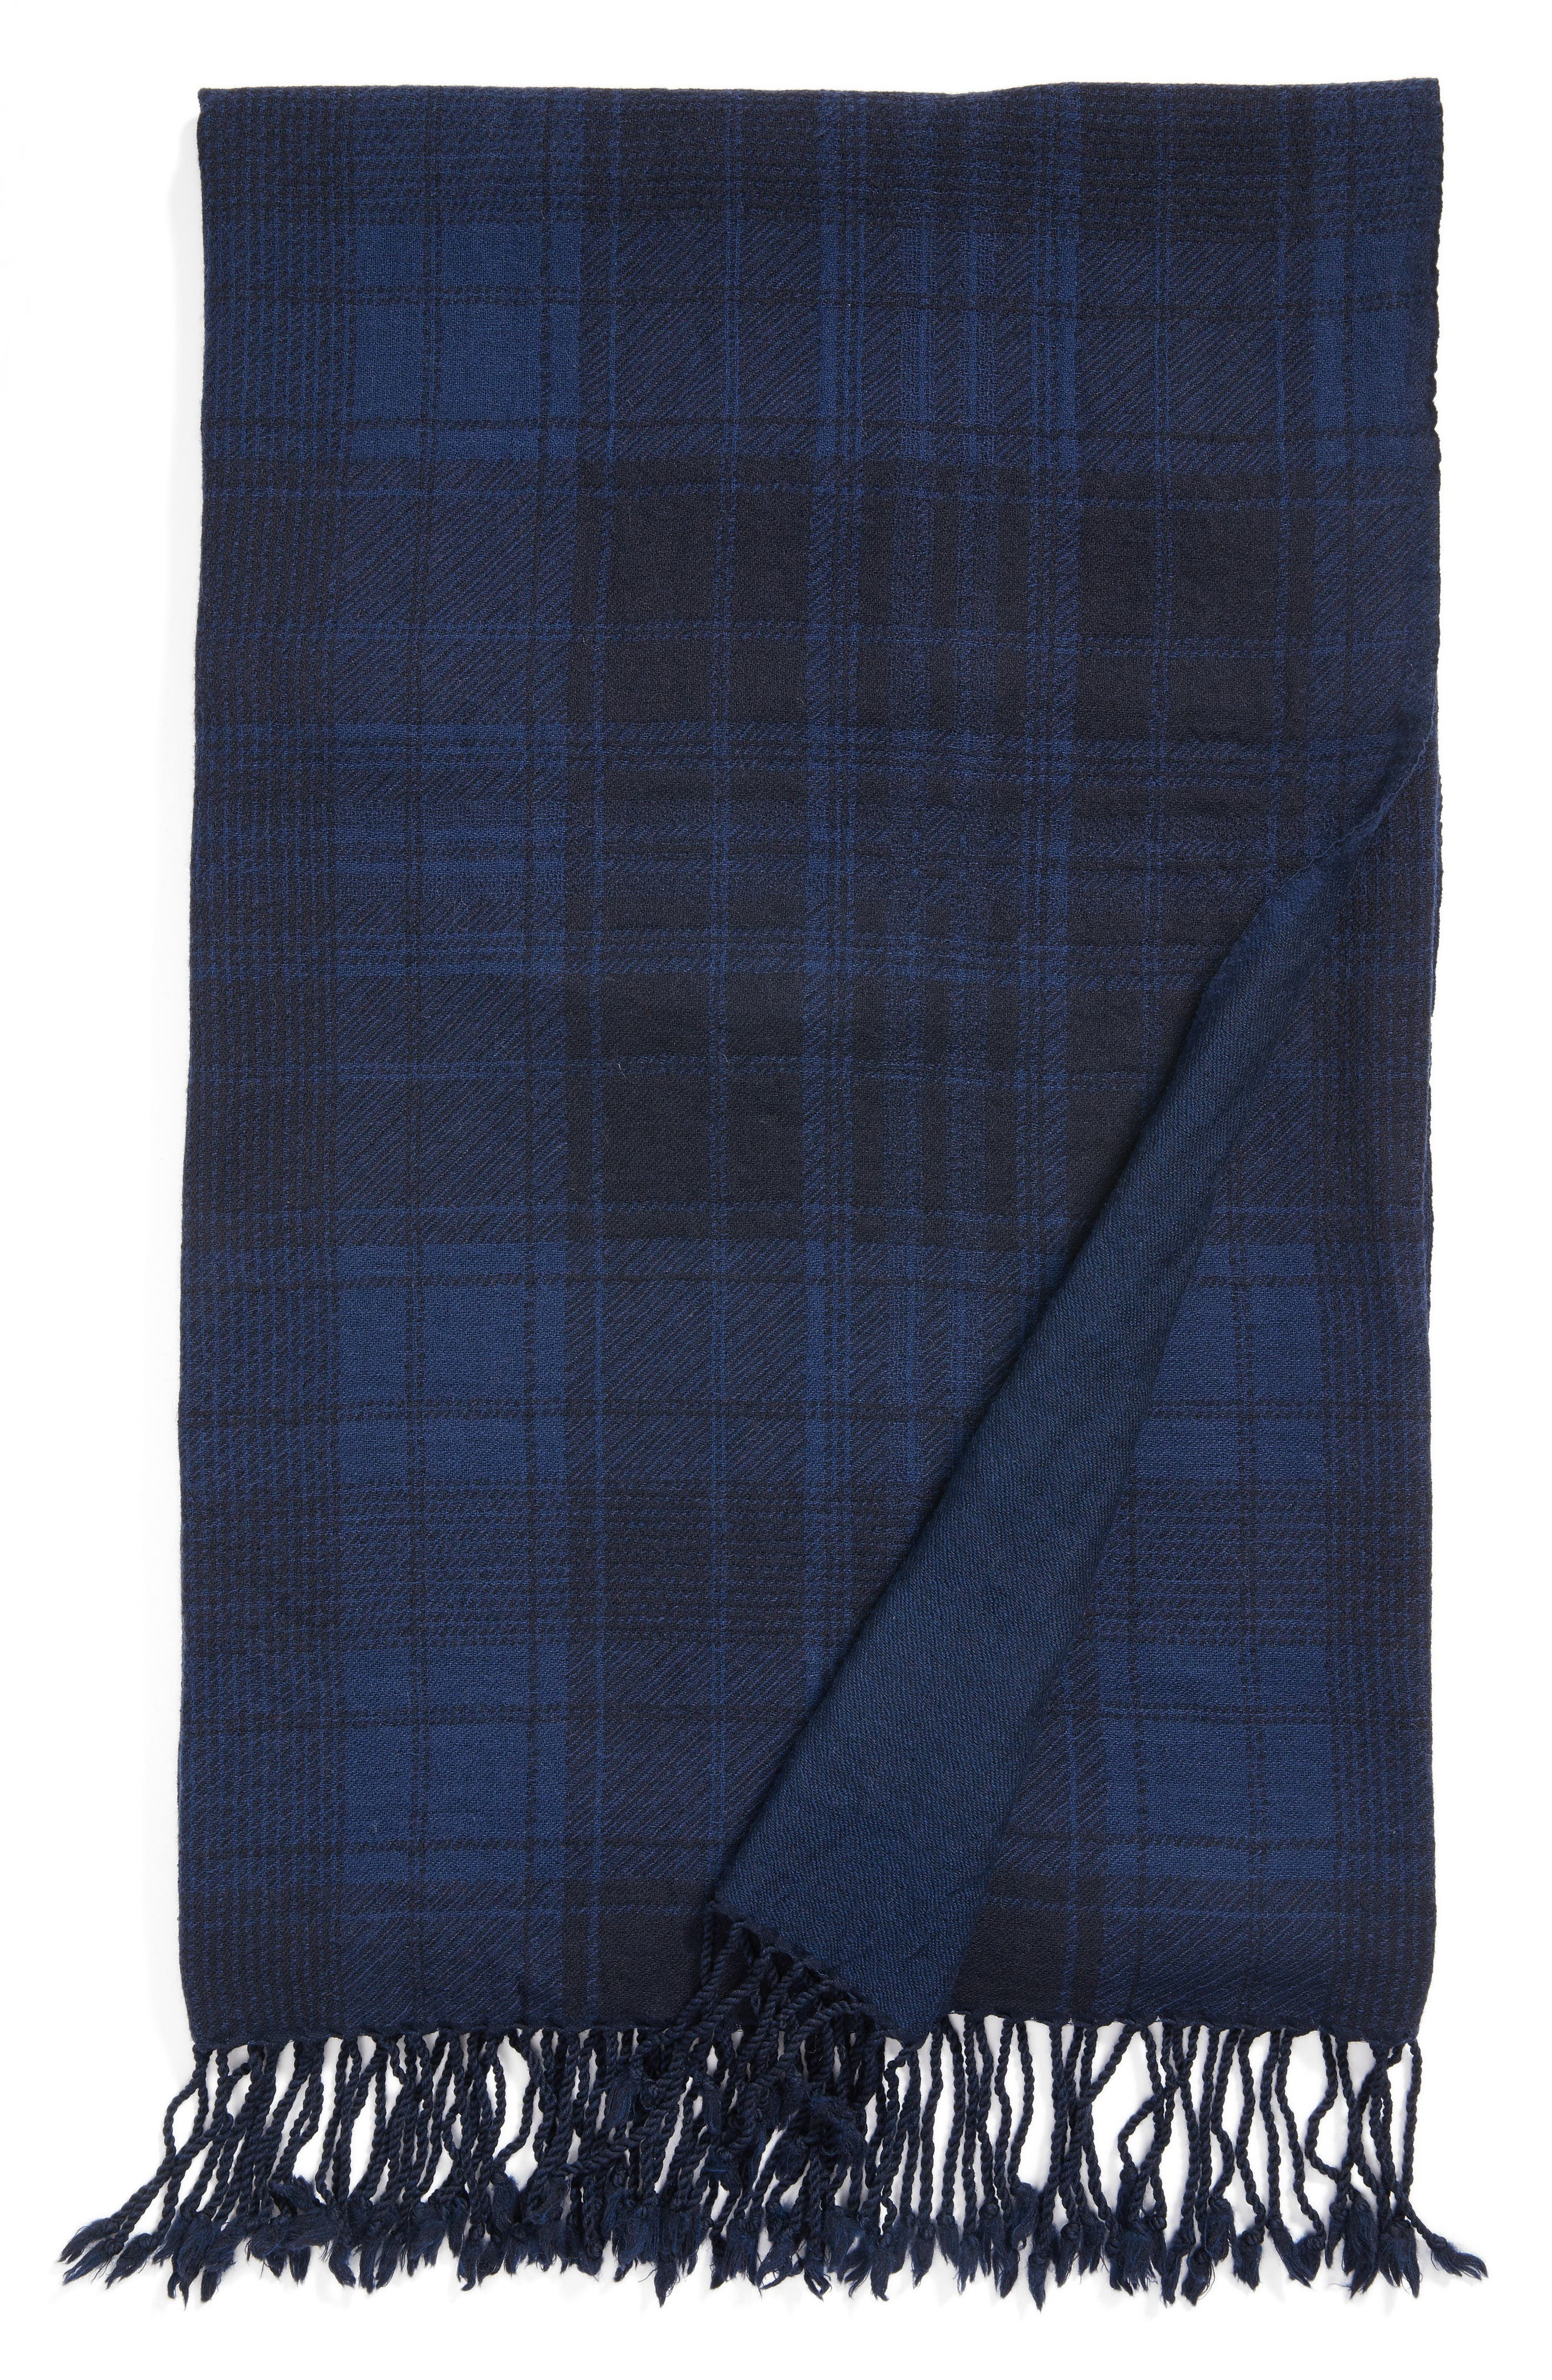 Modern Staples Plaid Double Face Merino Wool Throw